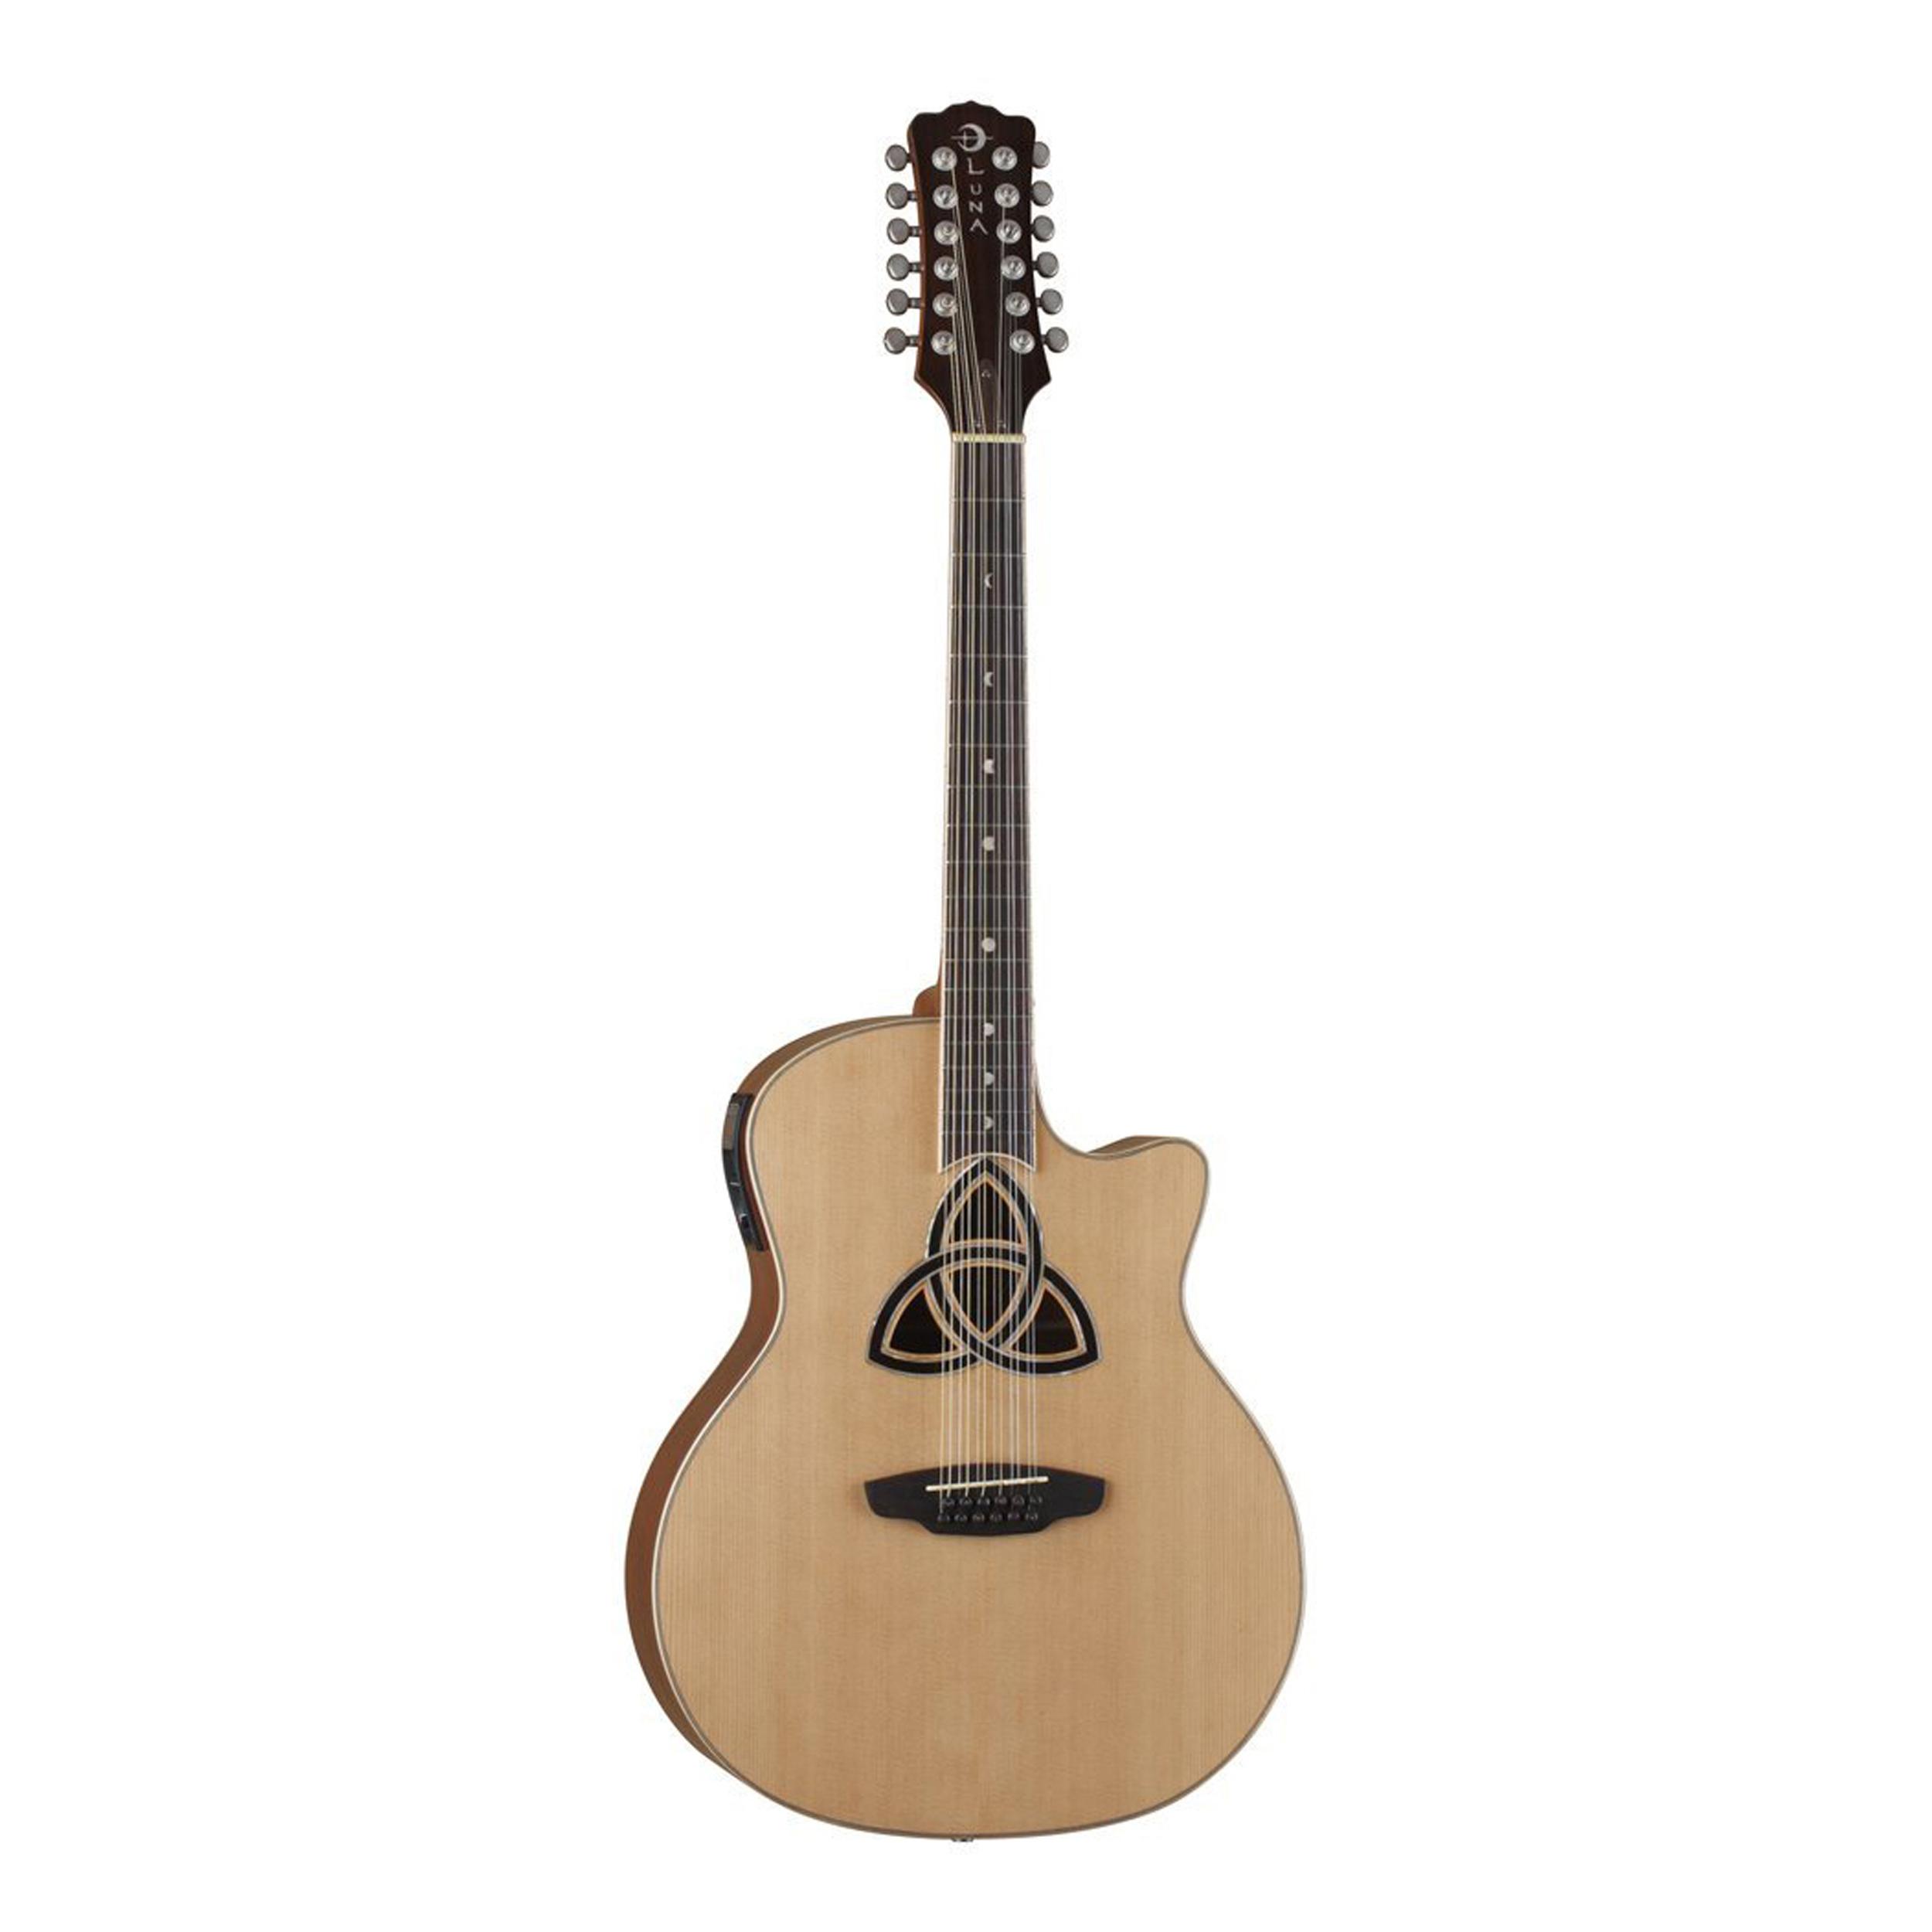 luna trinity 12 string acoustic electric guitar 886830595554 ebay. Black Bedroom Furniture Sets. Home Design Ideas